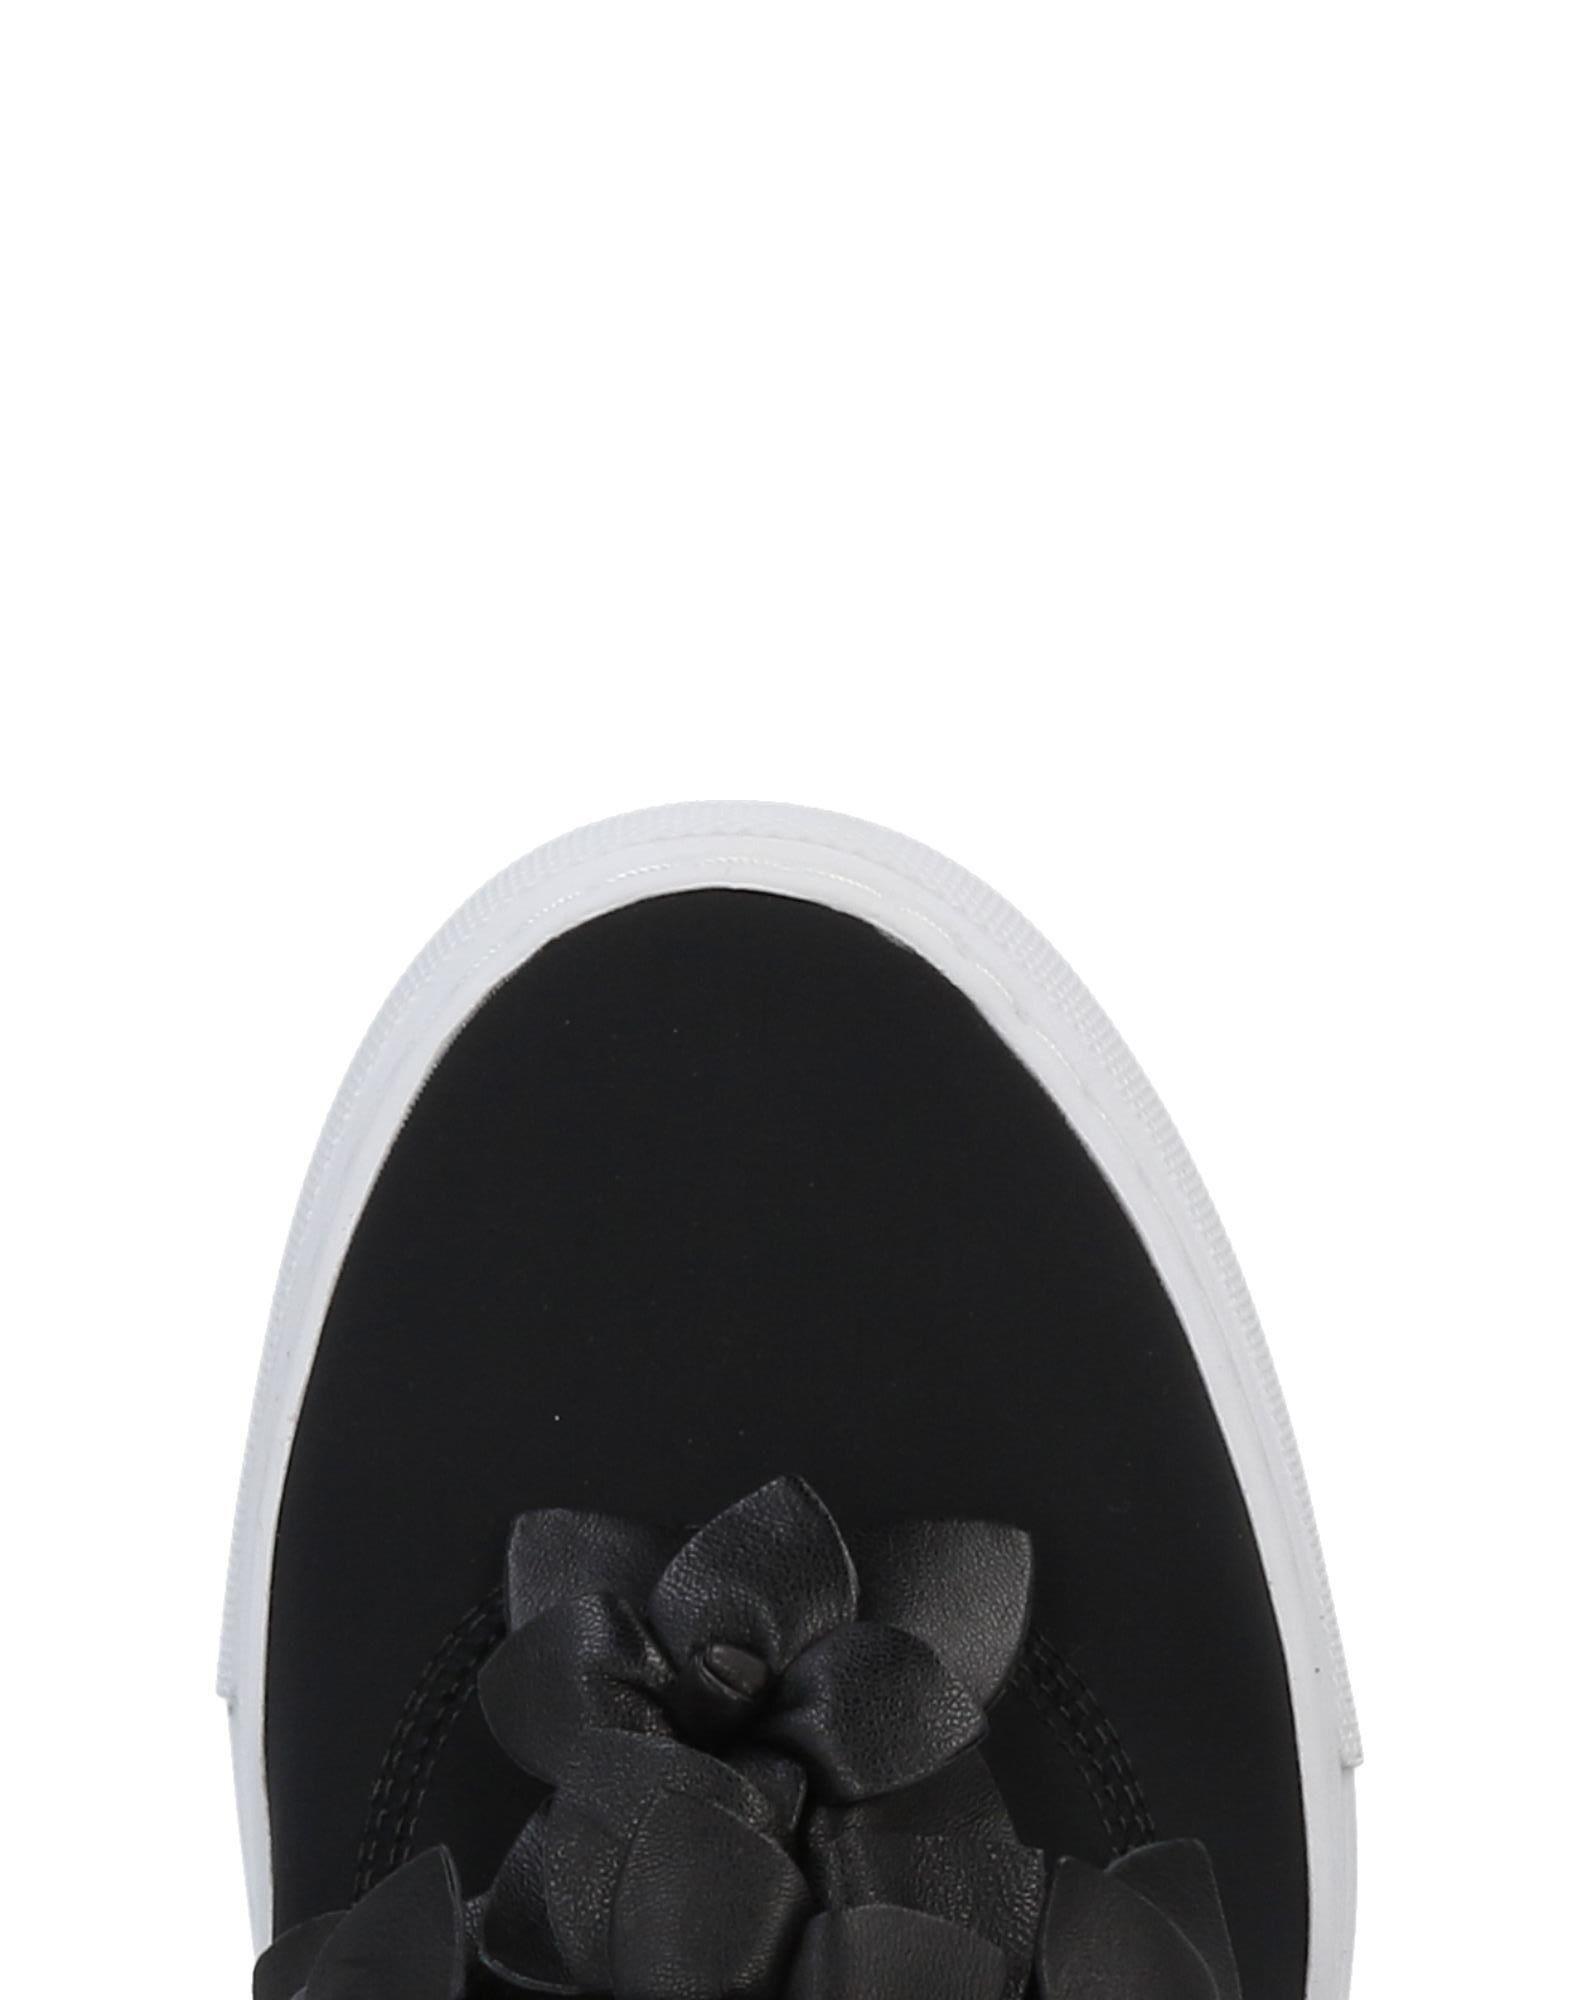 Stilvolle billige Schuhe Tory Burch 11444349BG Sneakers Damen  11444349BG Burch f305dc